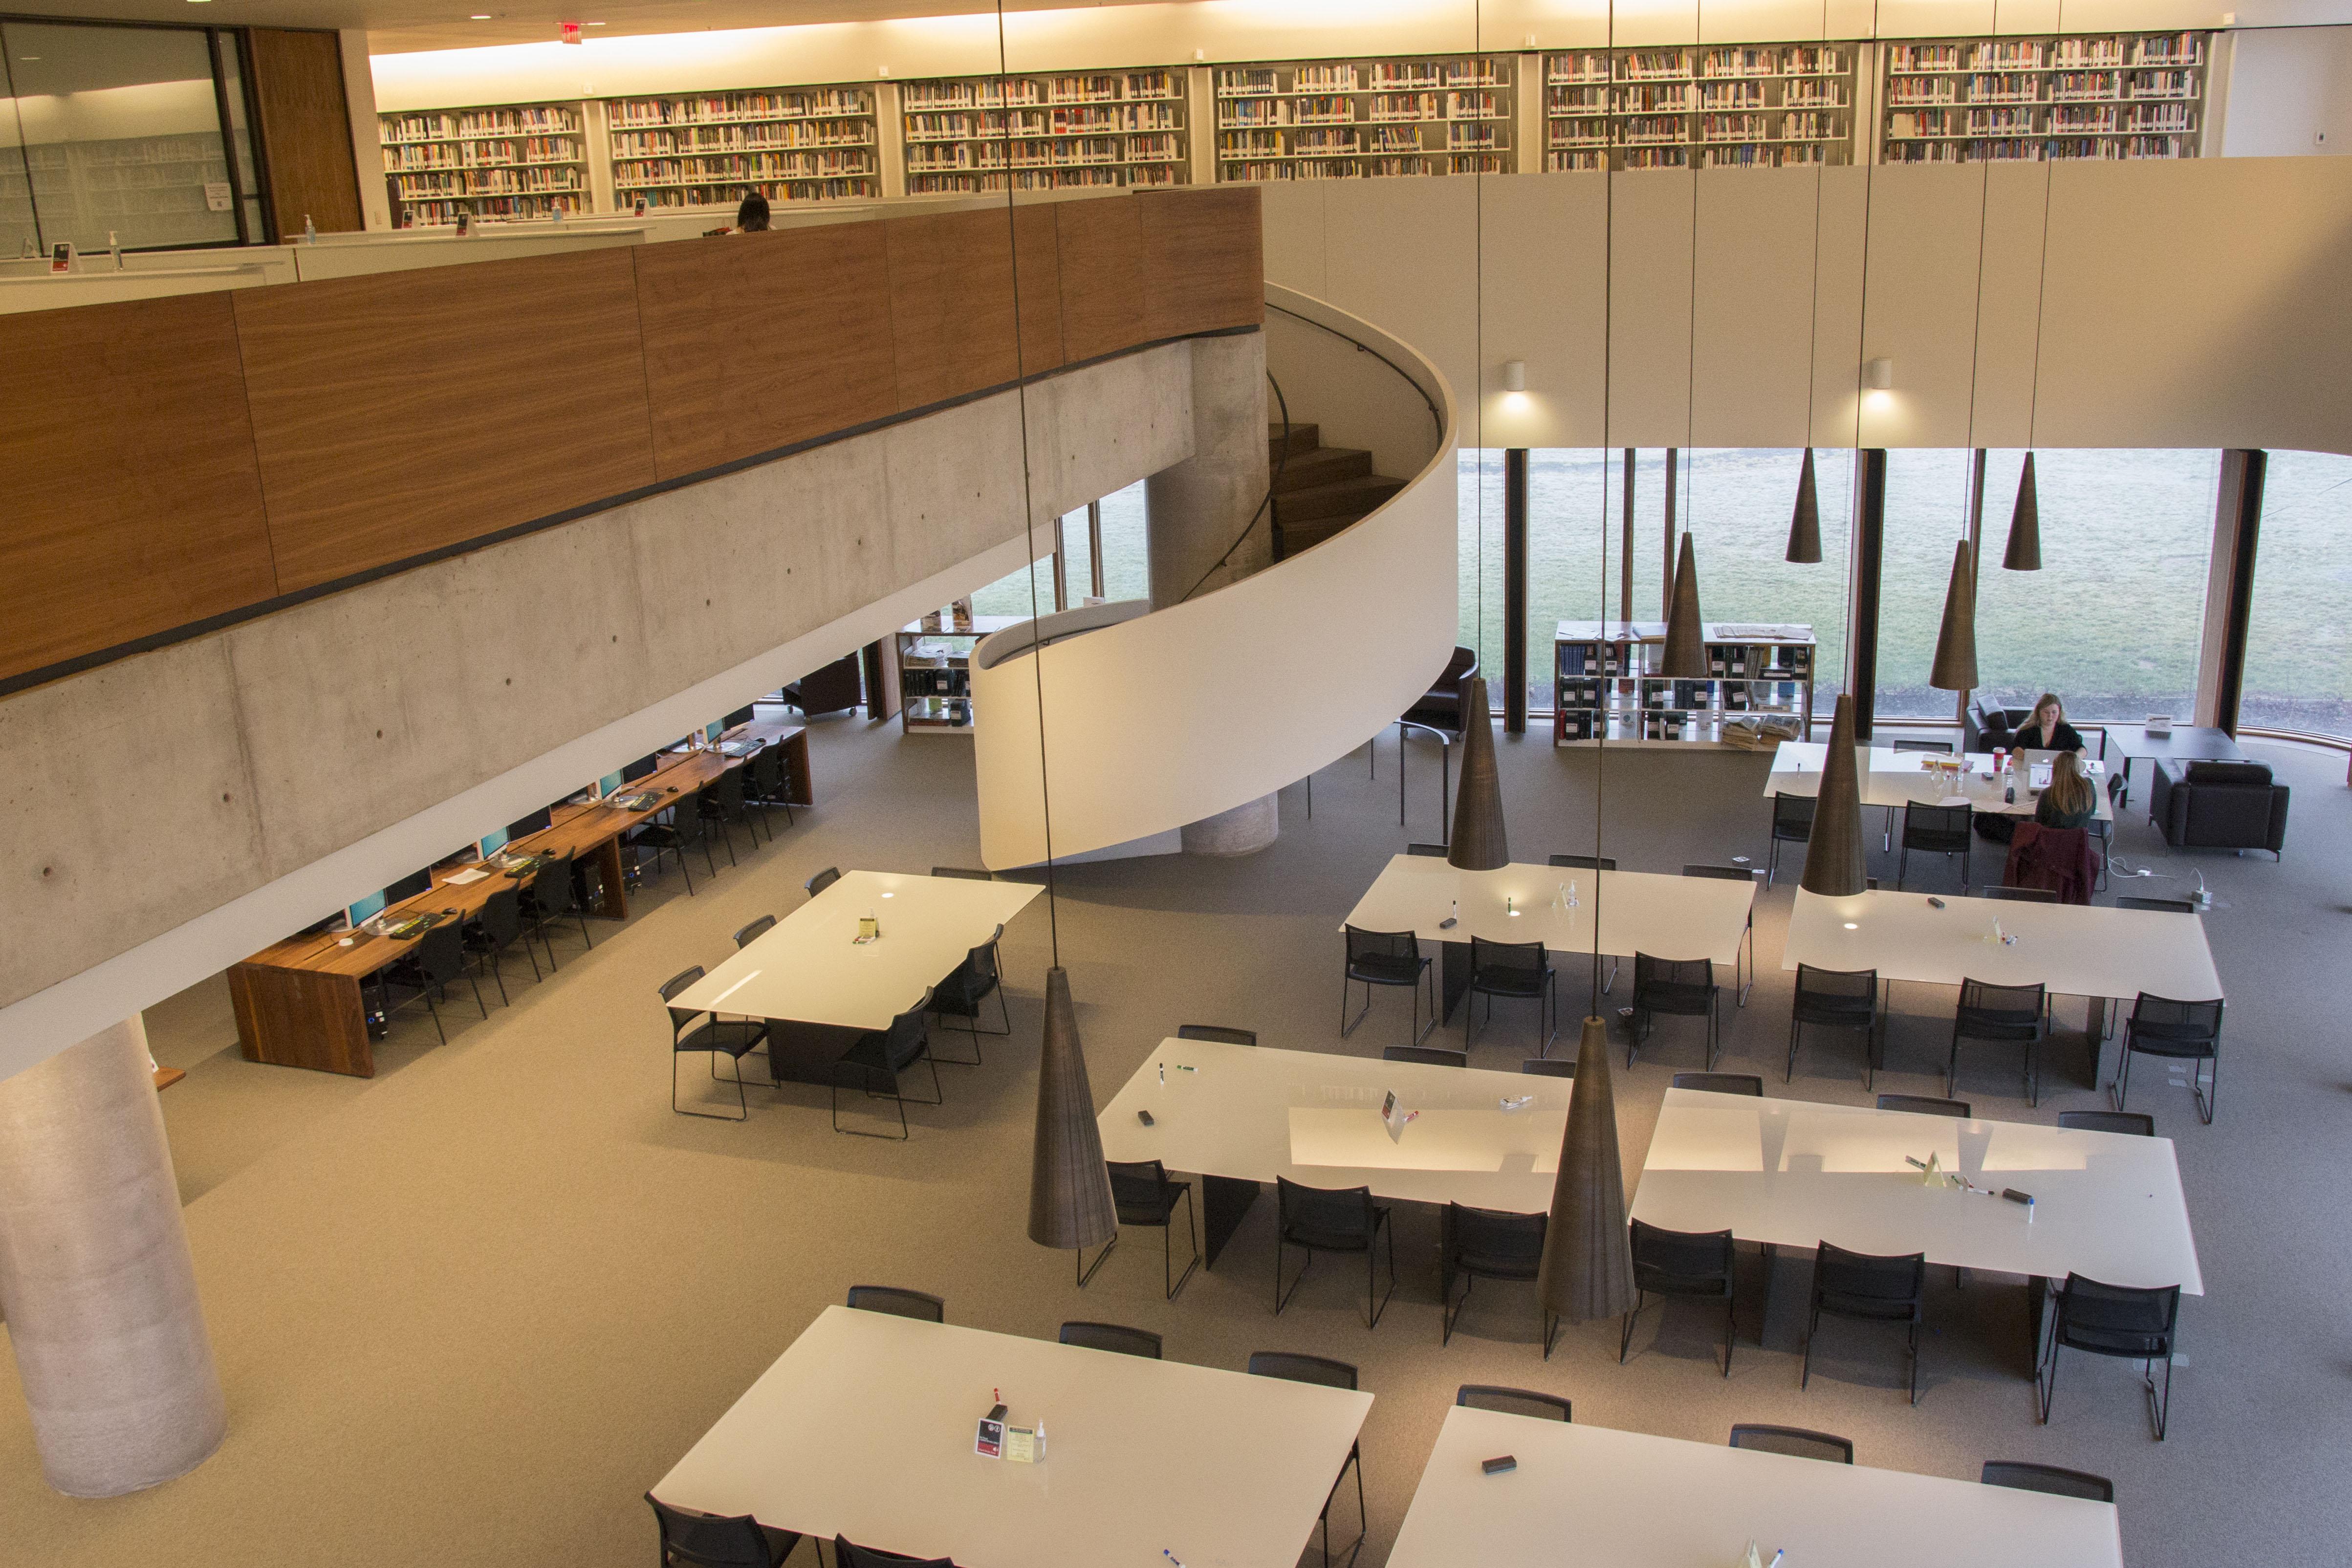 view of main floor from mezzanine